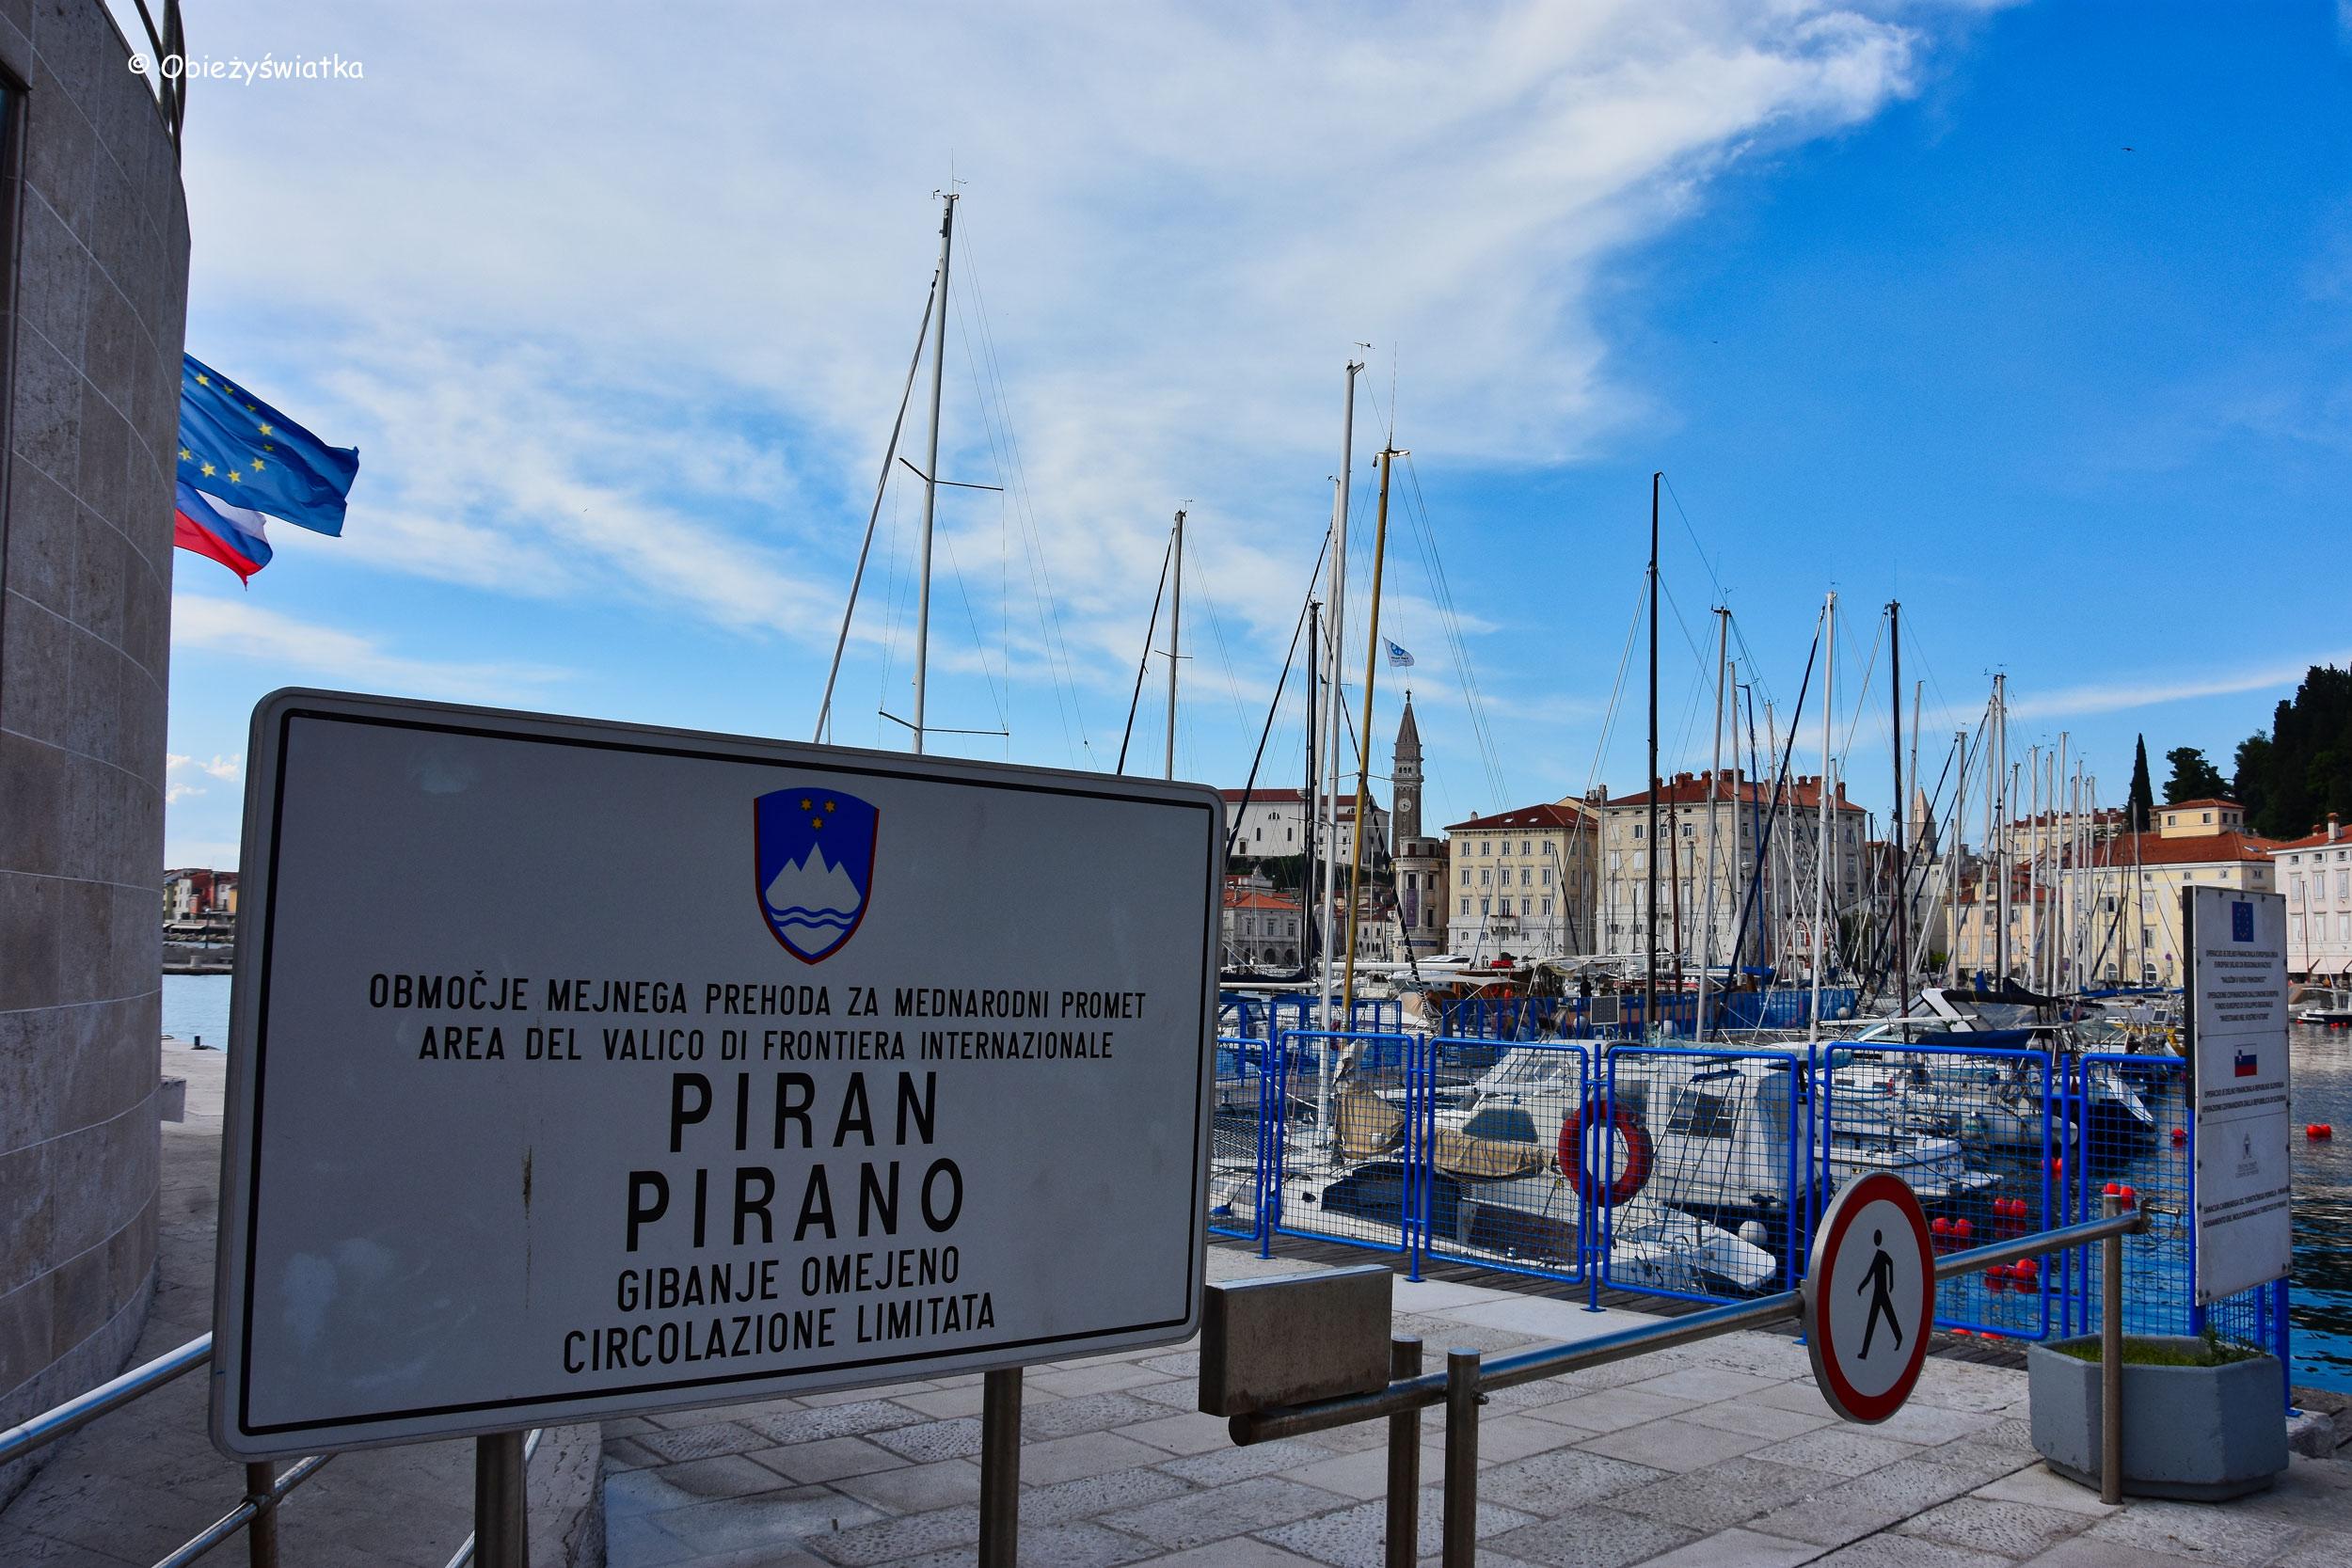 Piran i Pirano